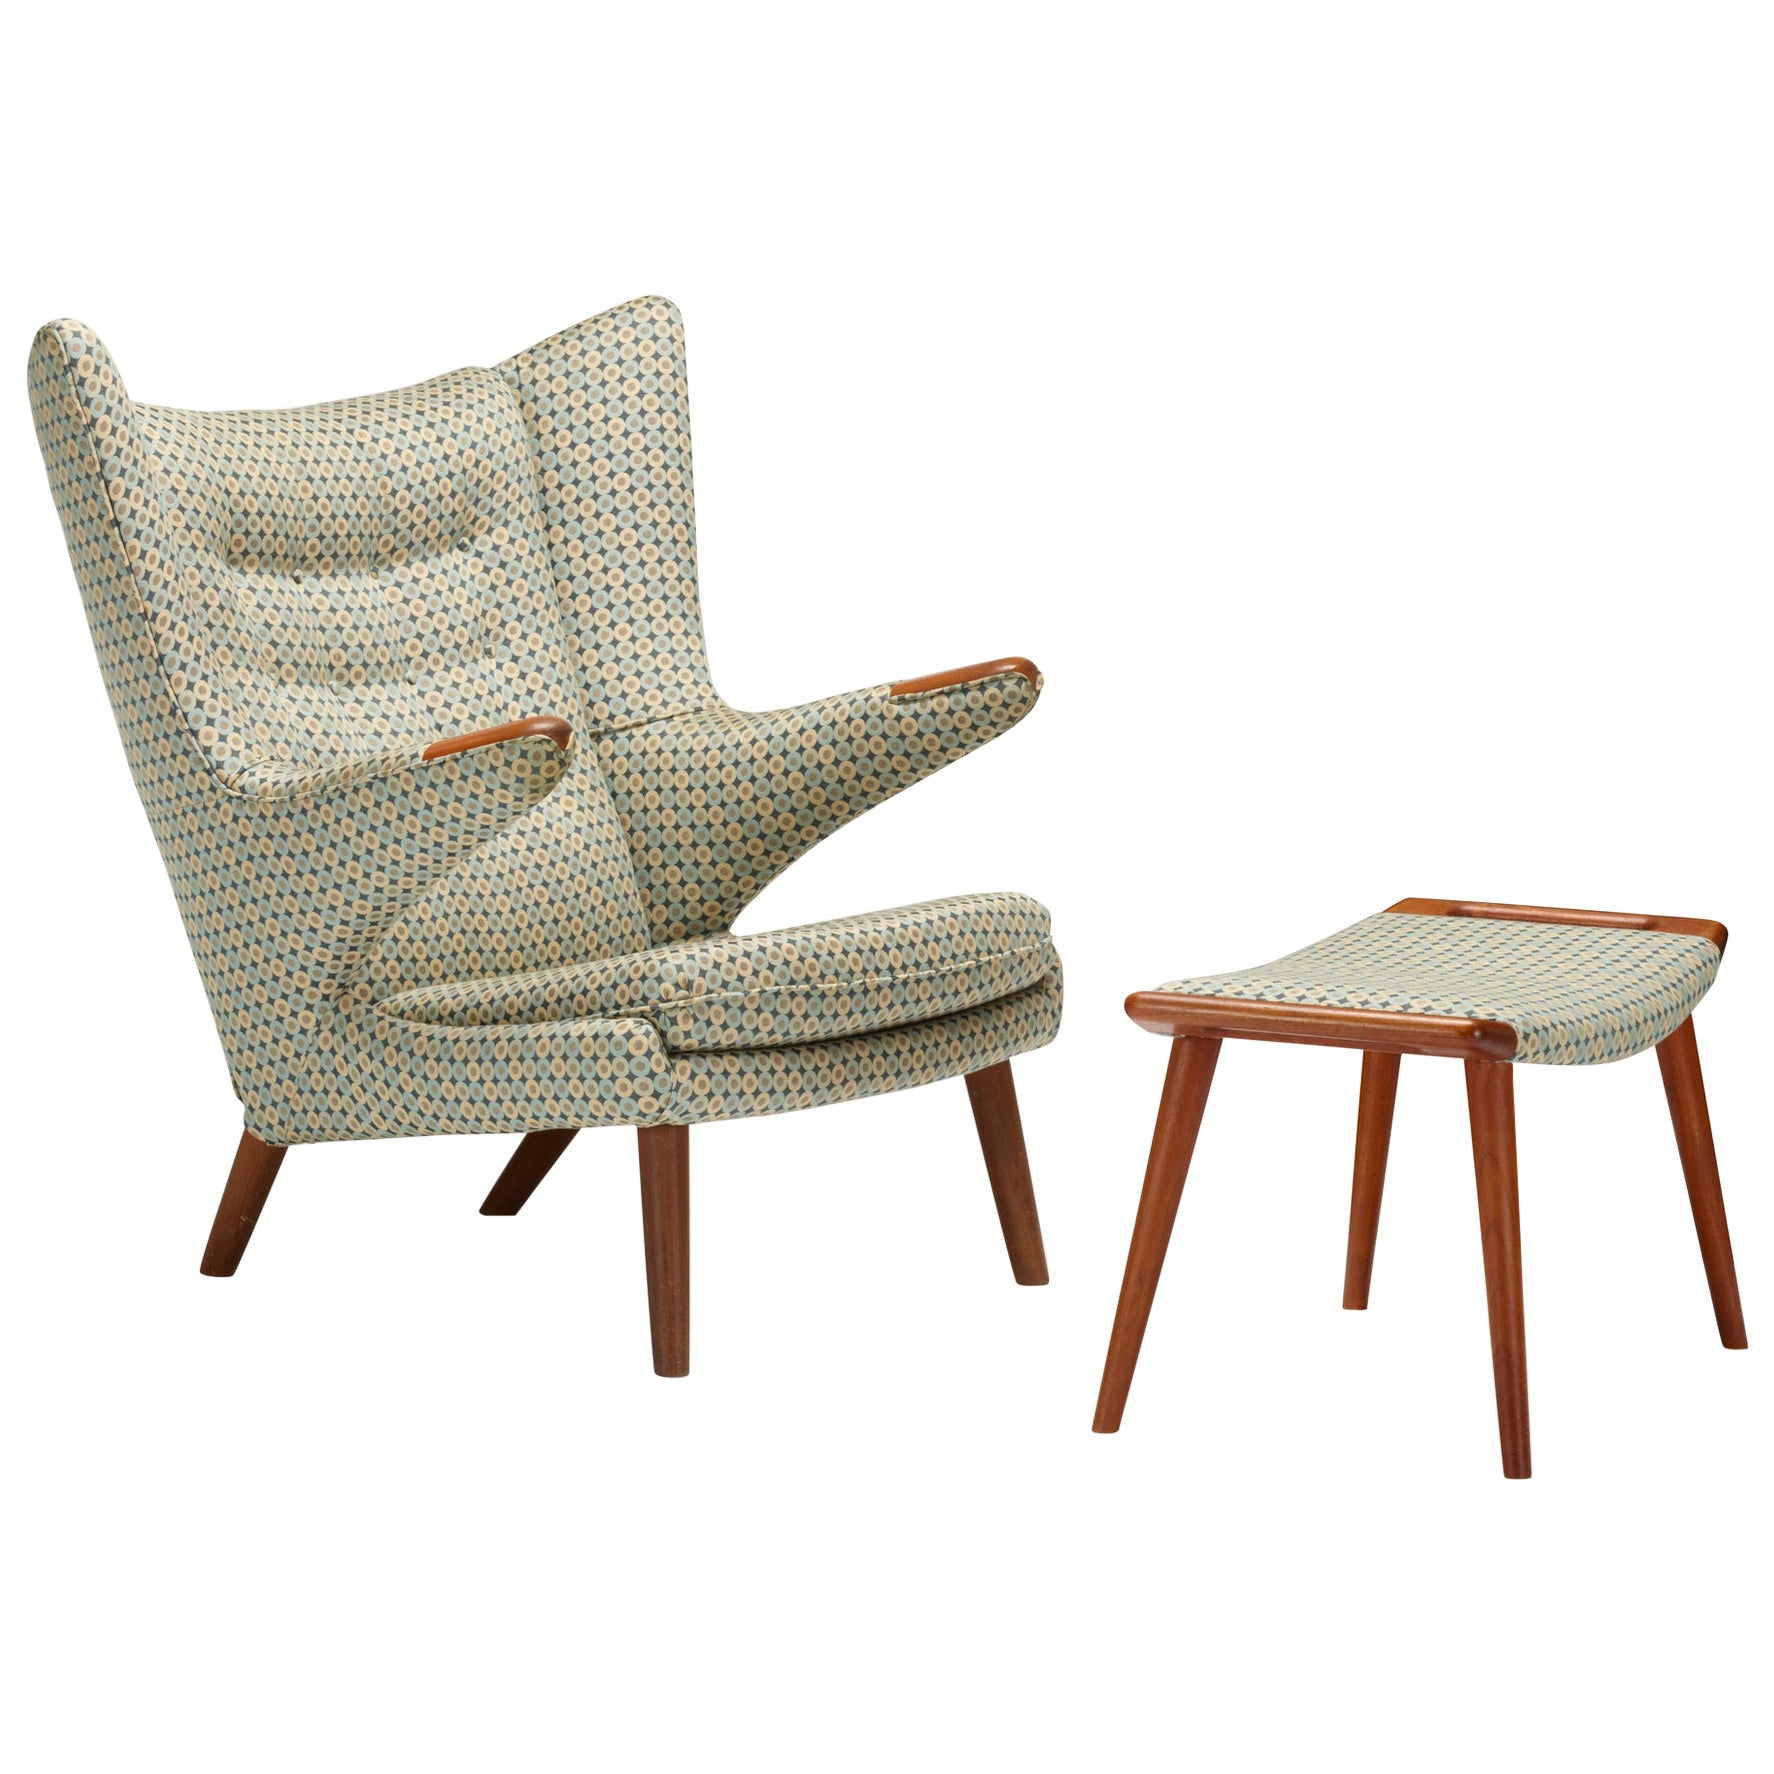 Teak ''Papa Bear'' Chair and Ottoman by Hans J. Wegner for A.P. Stolen